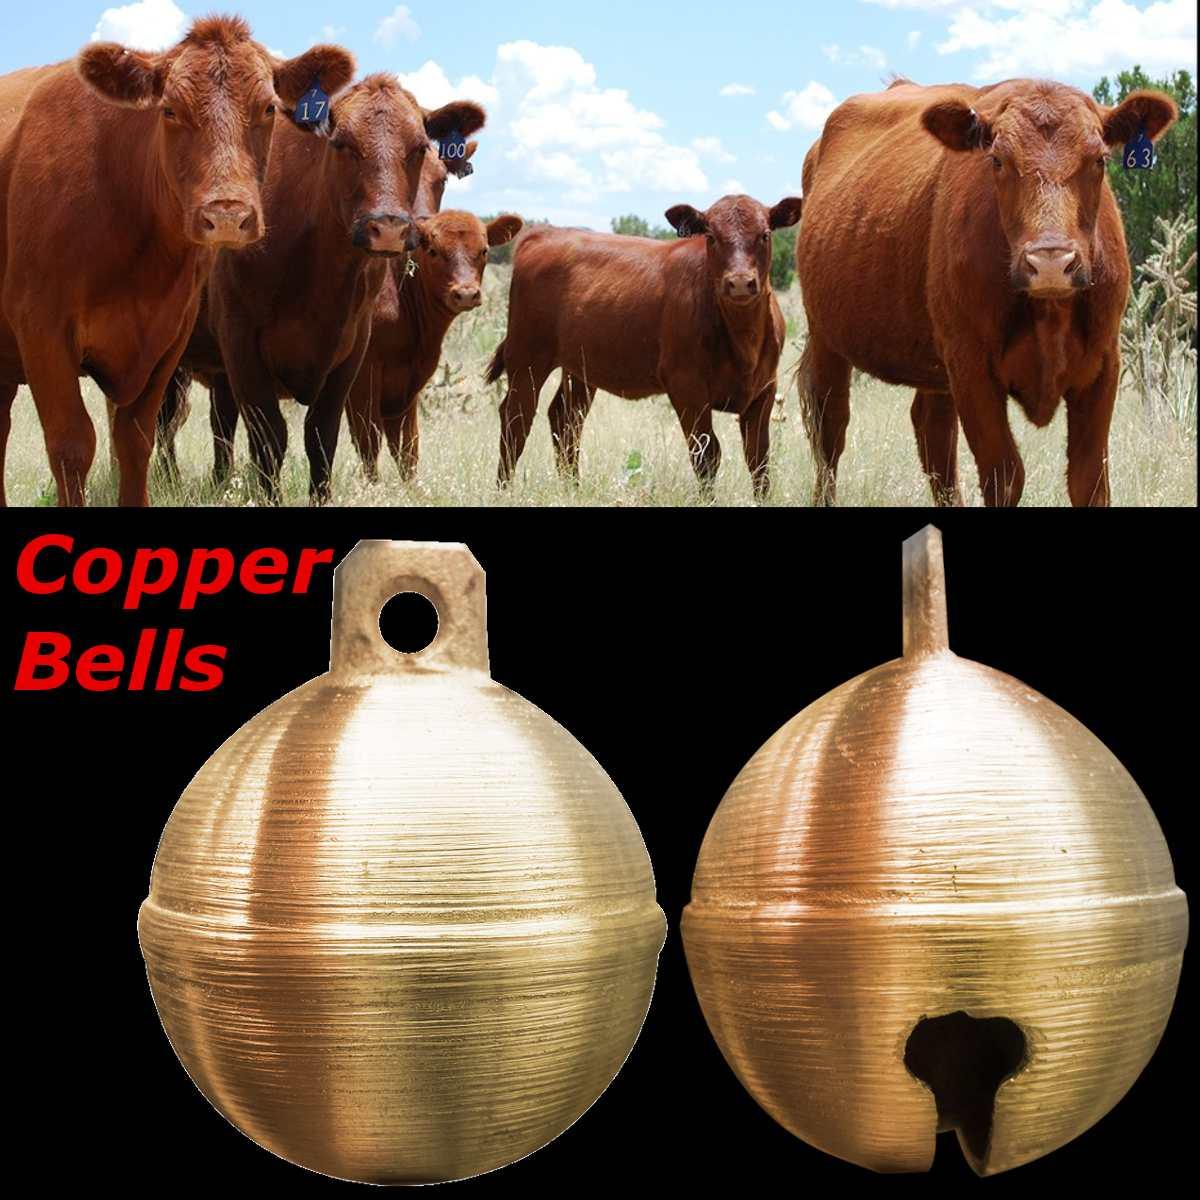 Animal Cow Horse Sheep Grazing Copper Bells Cattle Farm Copper Brass Bell USA